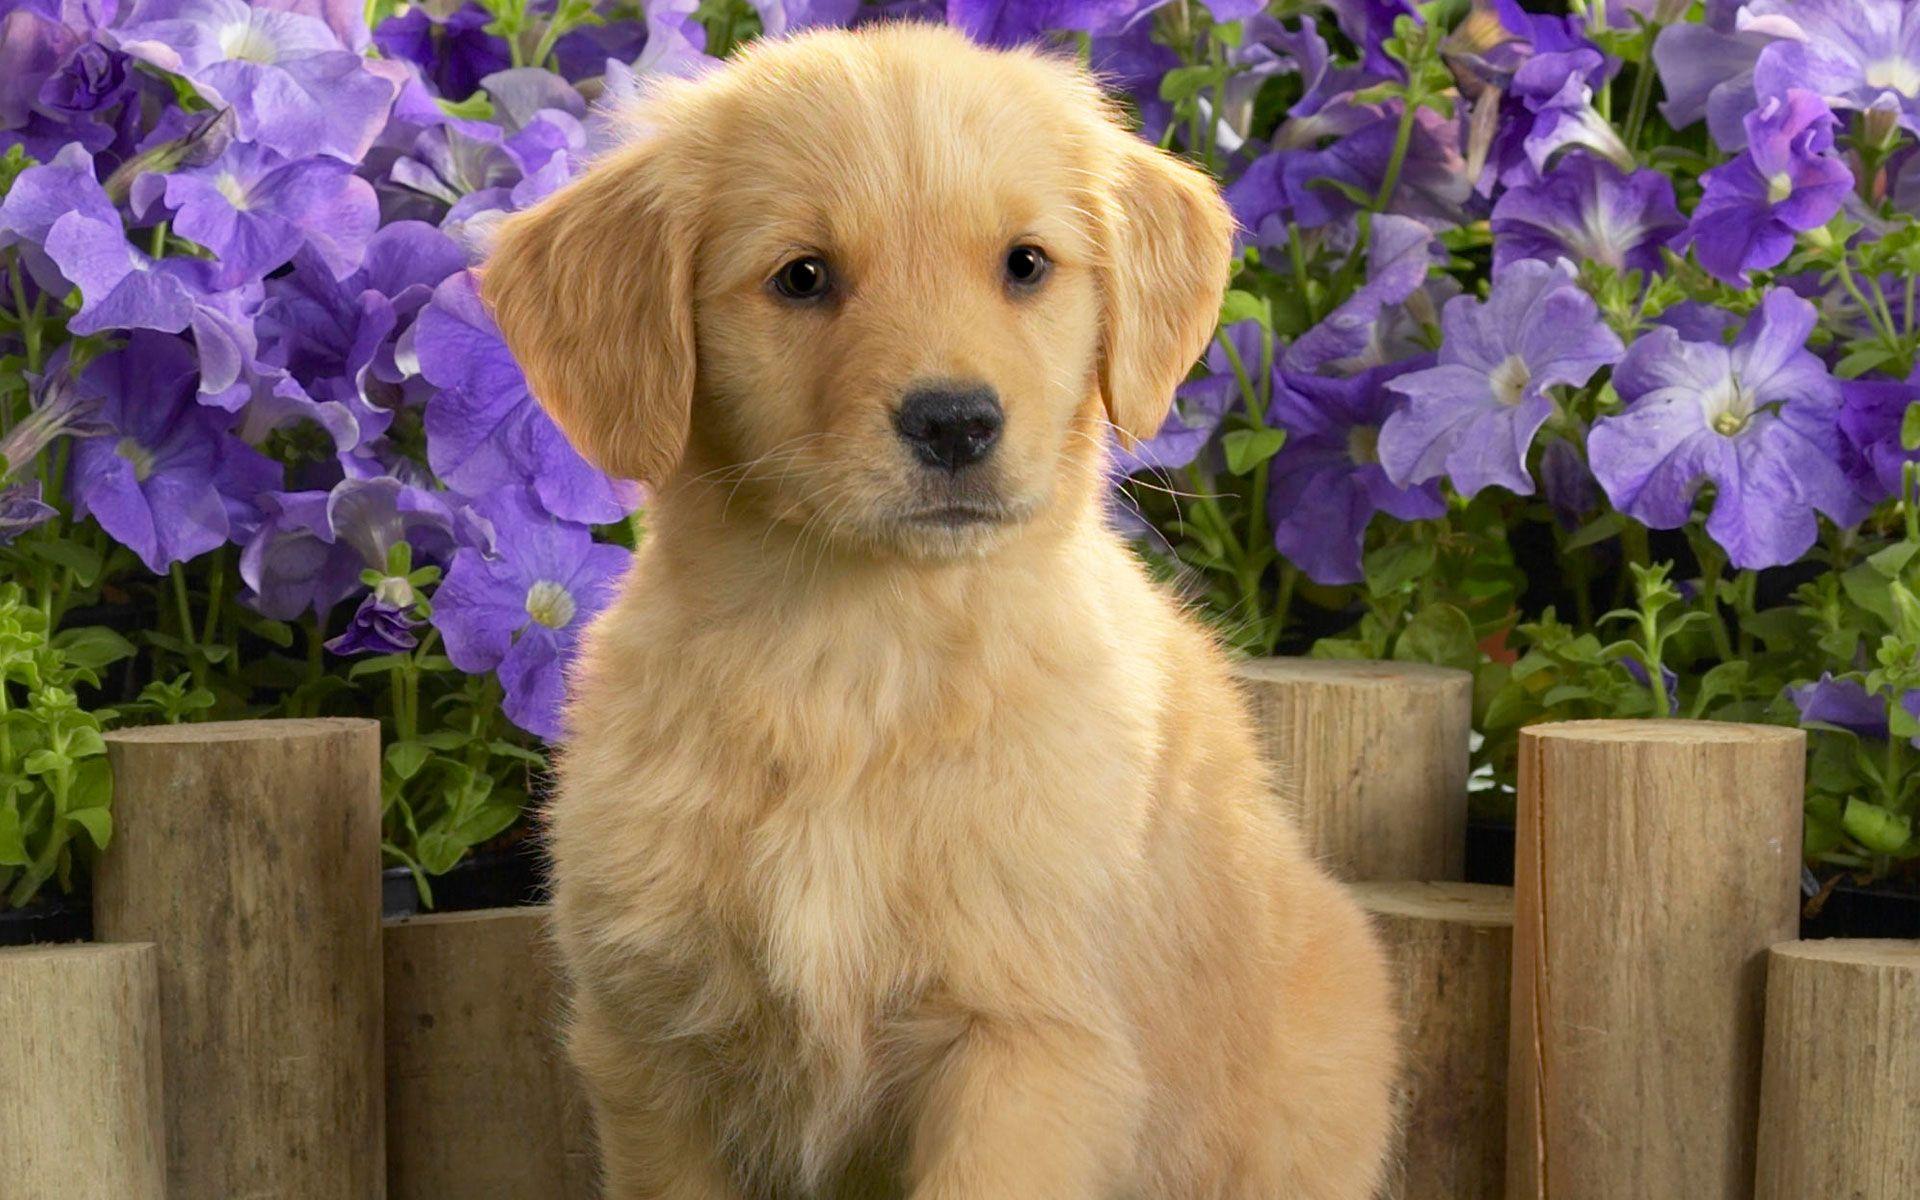 Yellow Labrador Puppy Wallpaper Http Www 56pic Com Animals